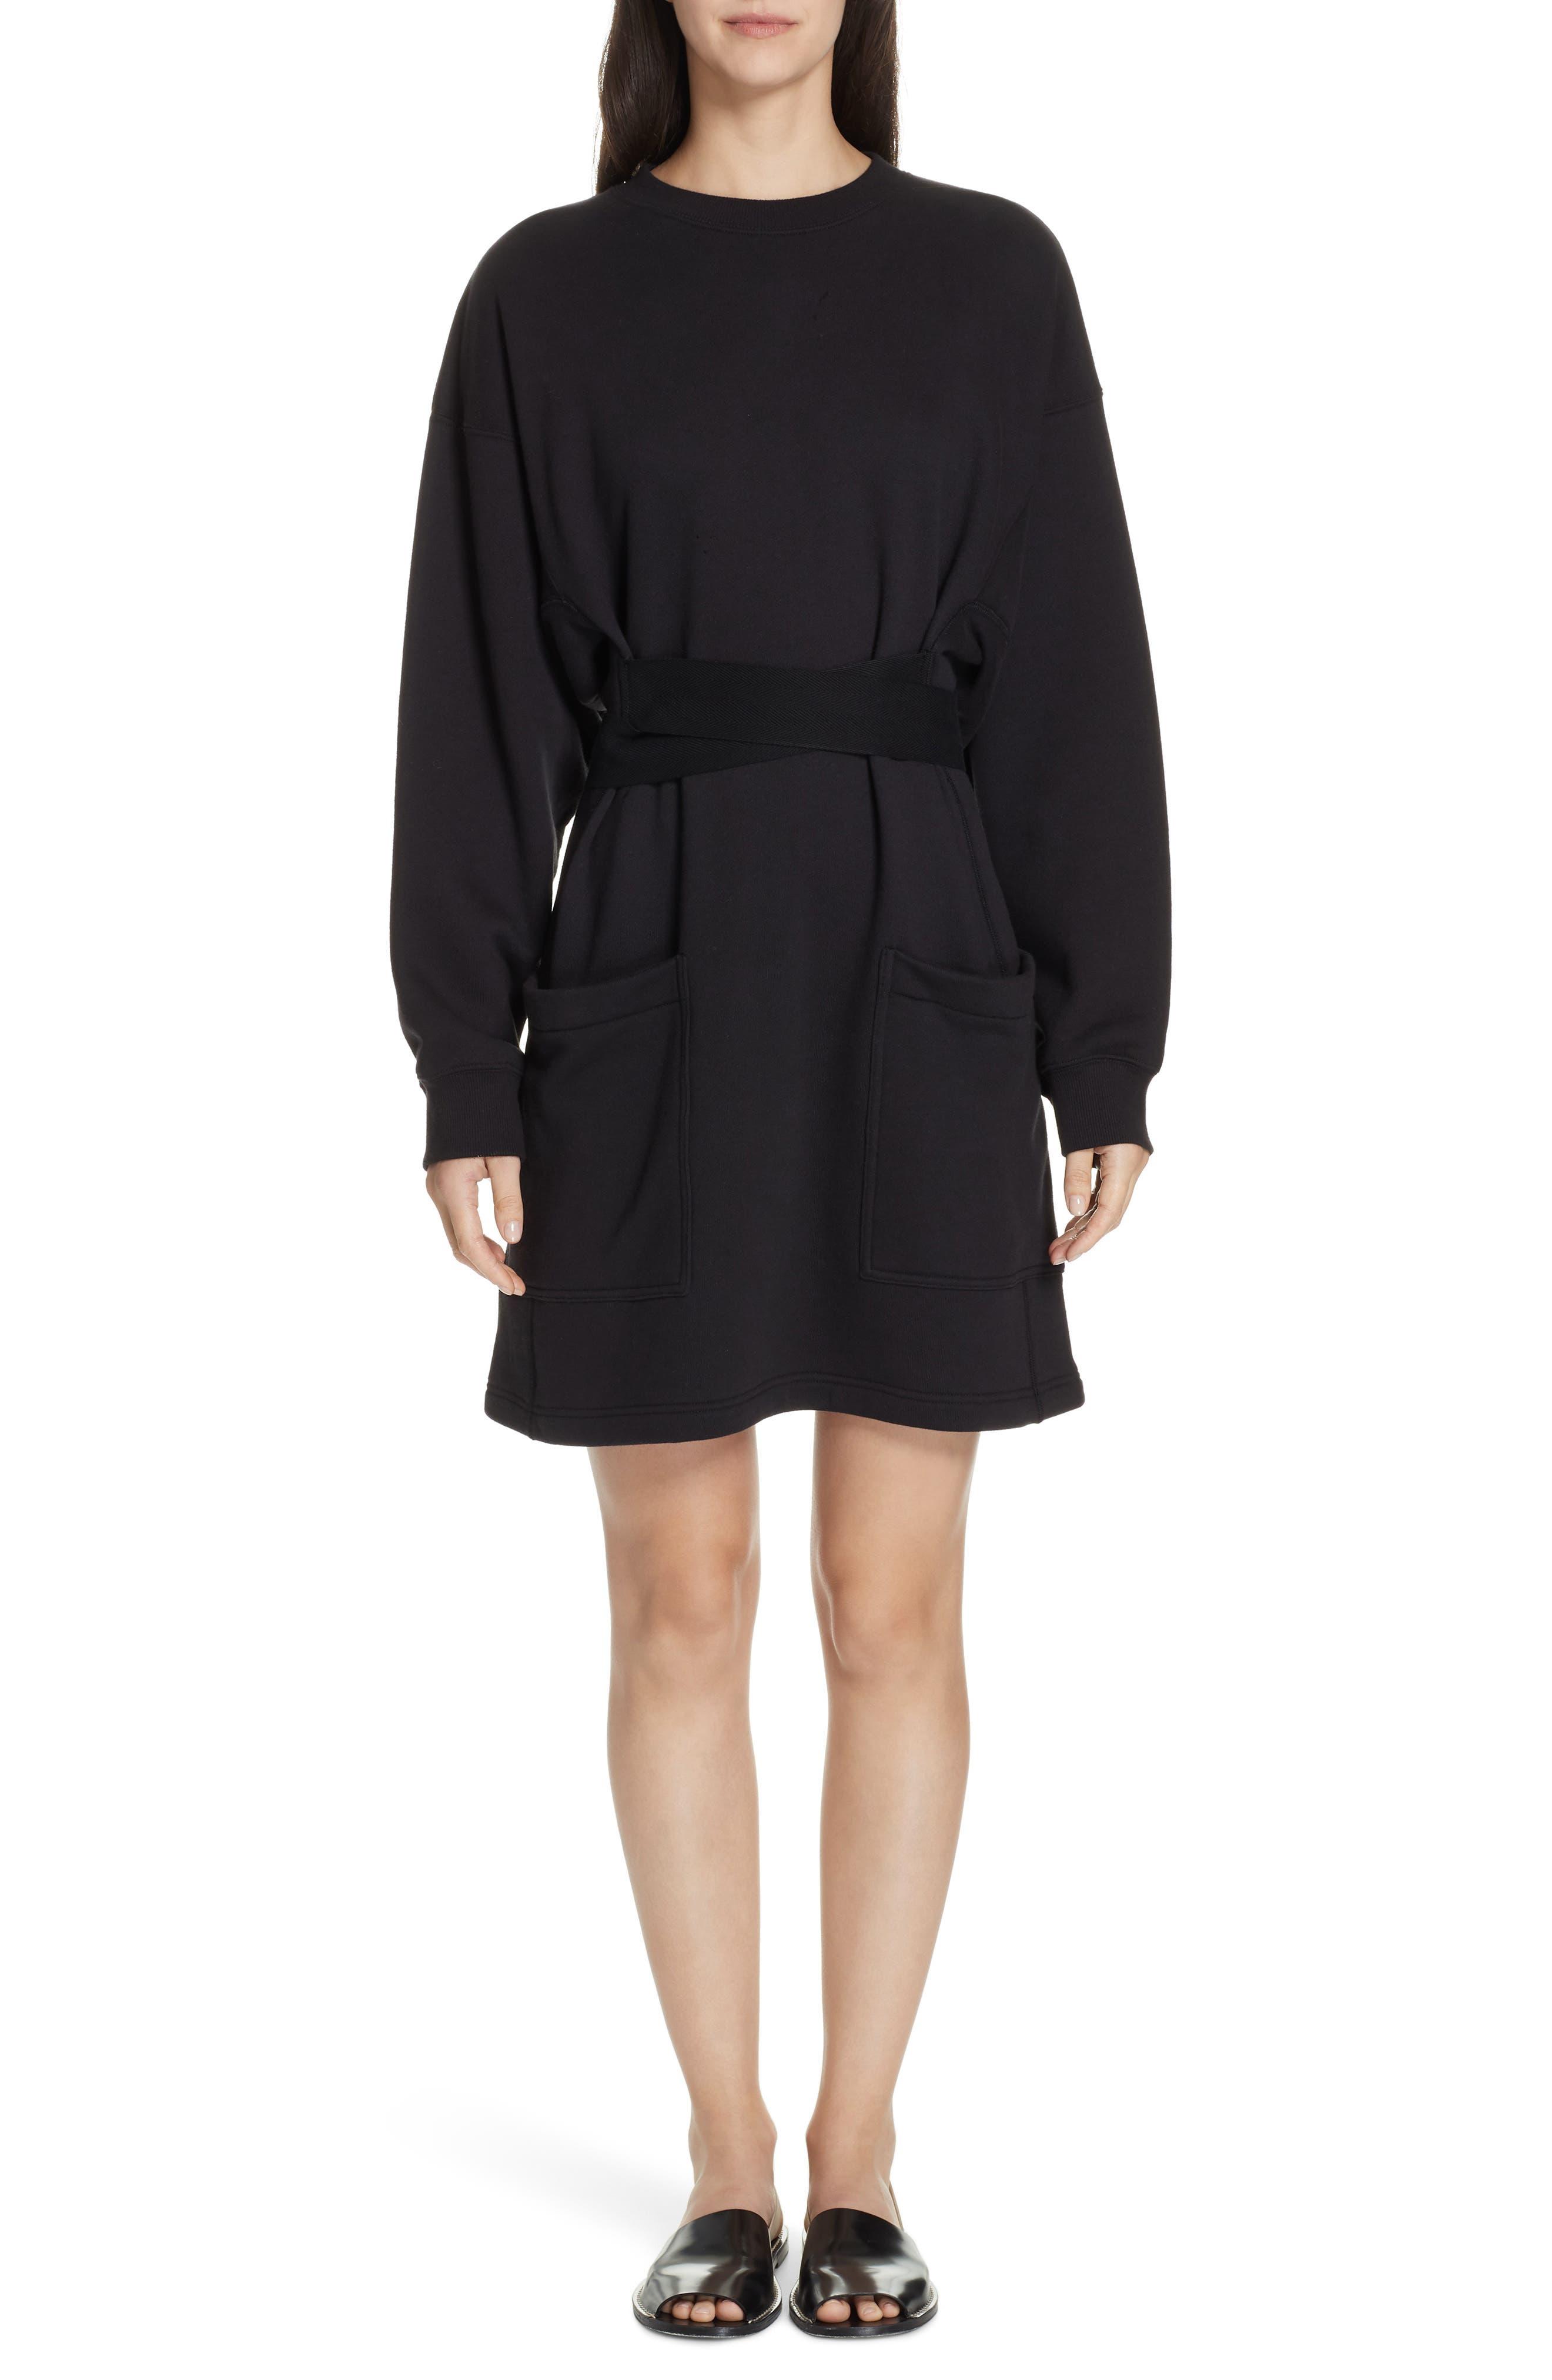 PSWL Belted Sweatshirt Dress, Main, color, BLACK